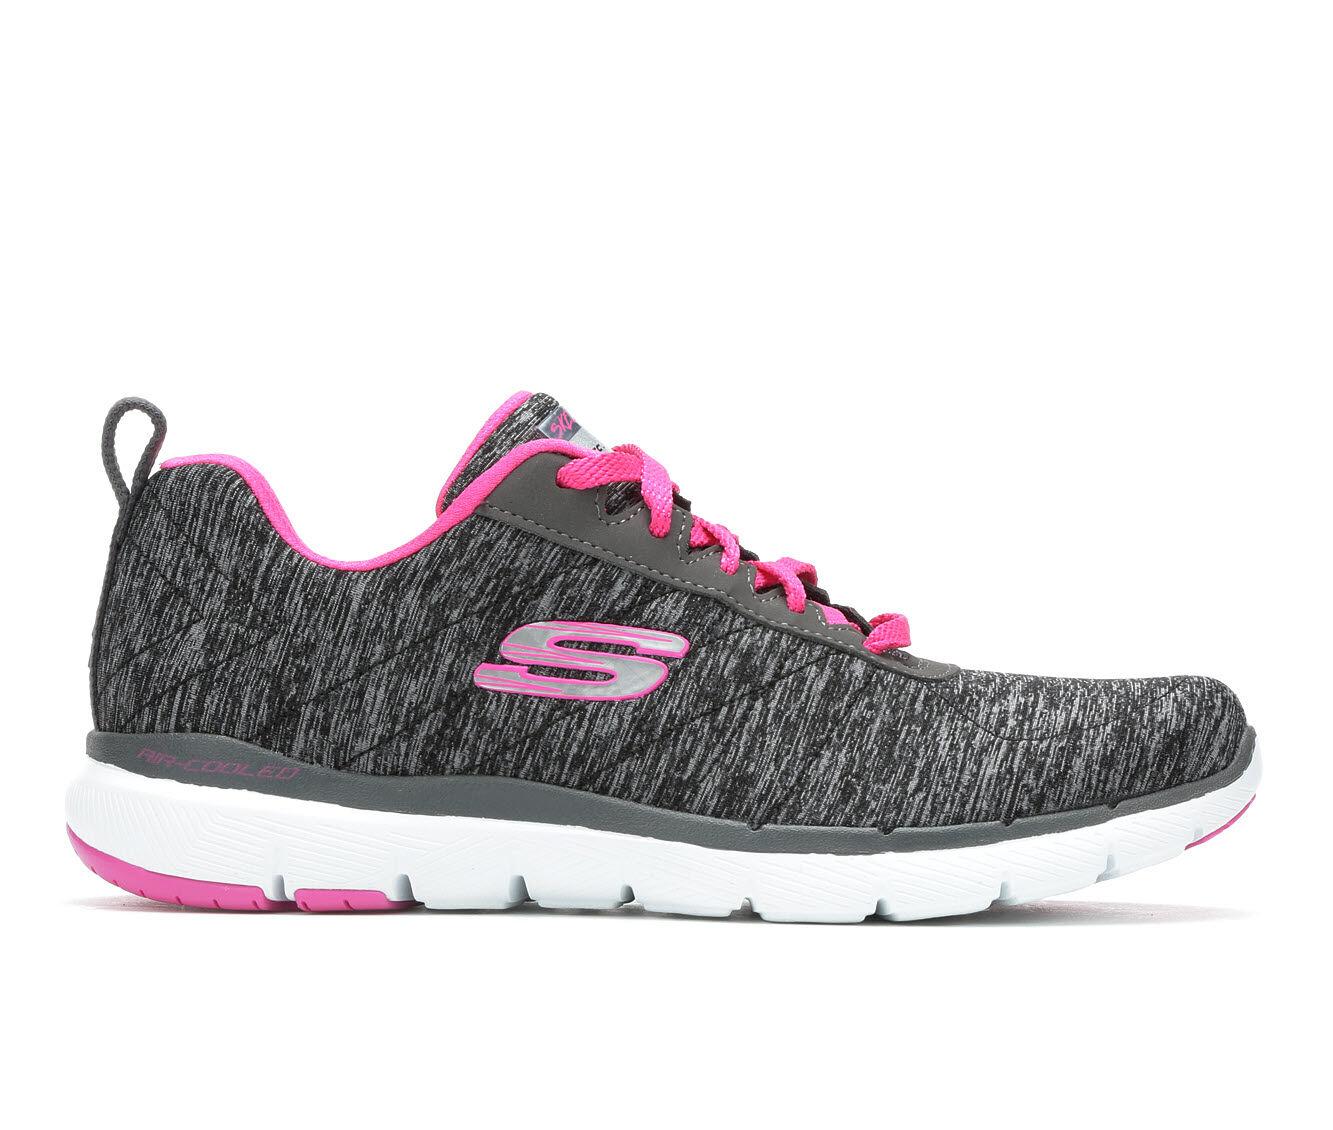 Women's Skechers Insiders 13067 Sneakers Black/Grey/Pink